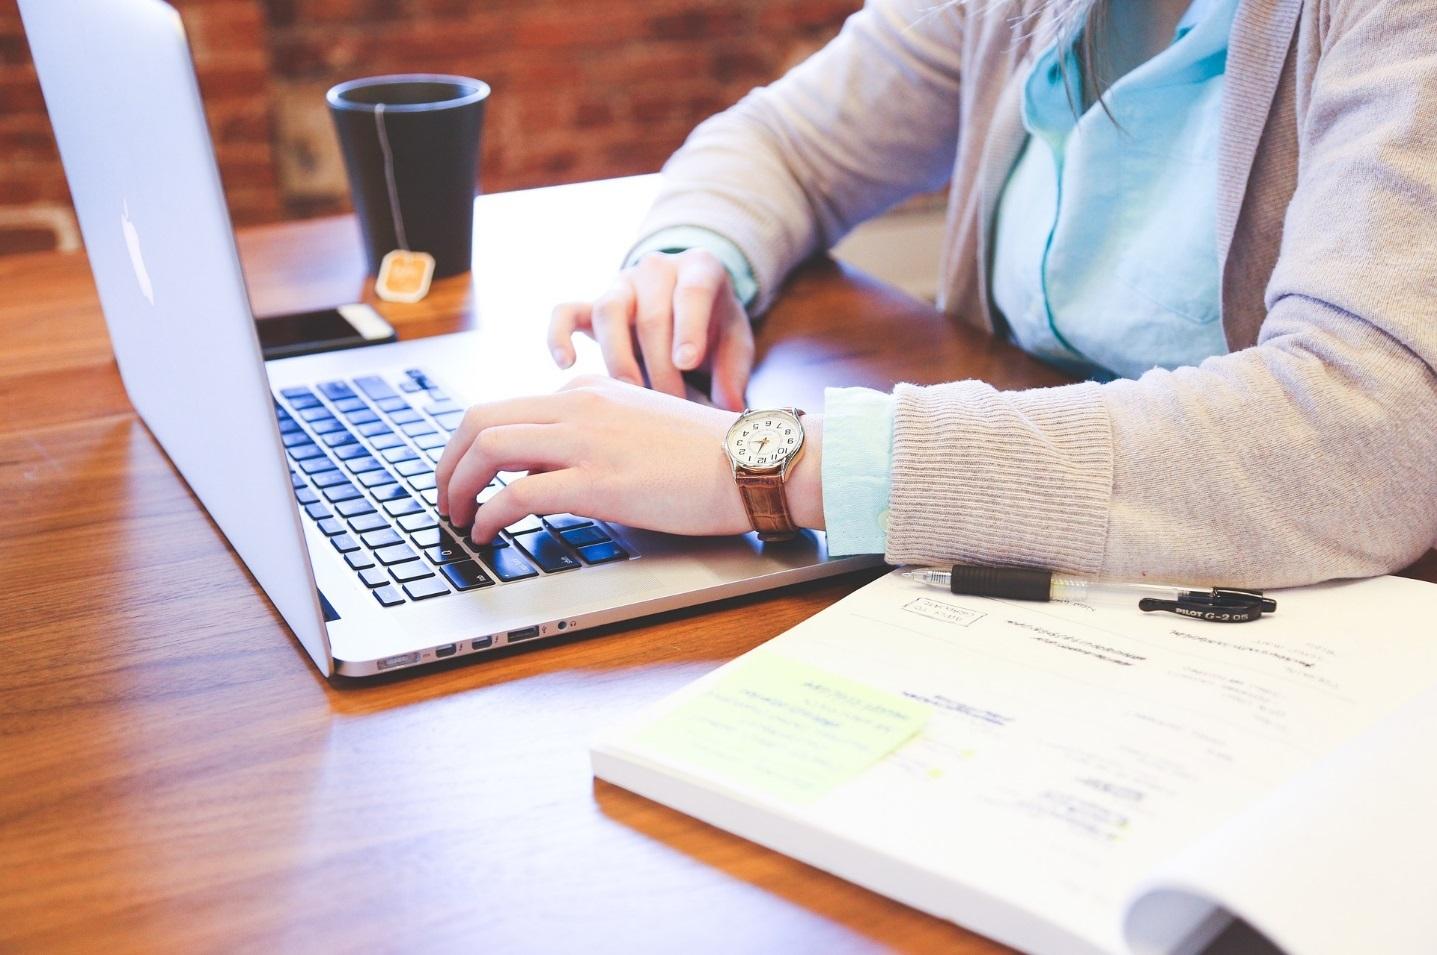 Frau benutzt Laptop. [Copyright = StartupStockPhotos / pixabay.com]